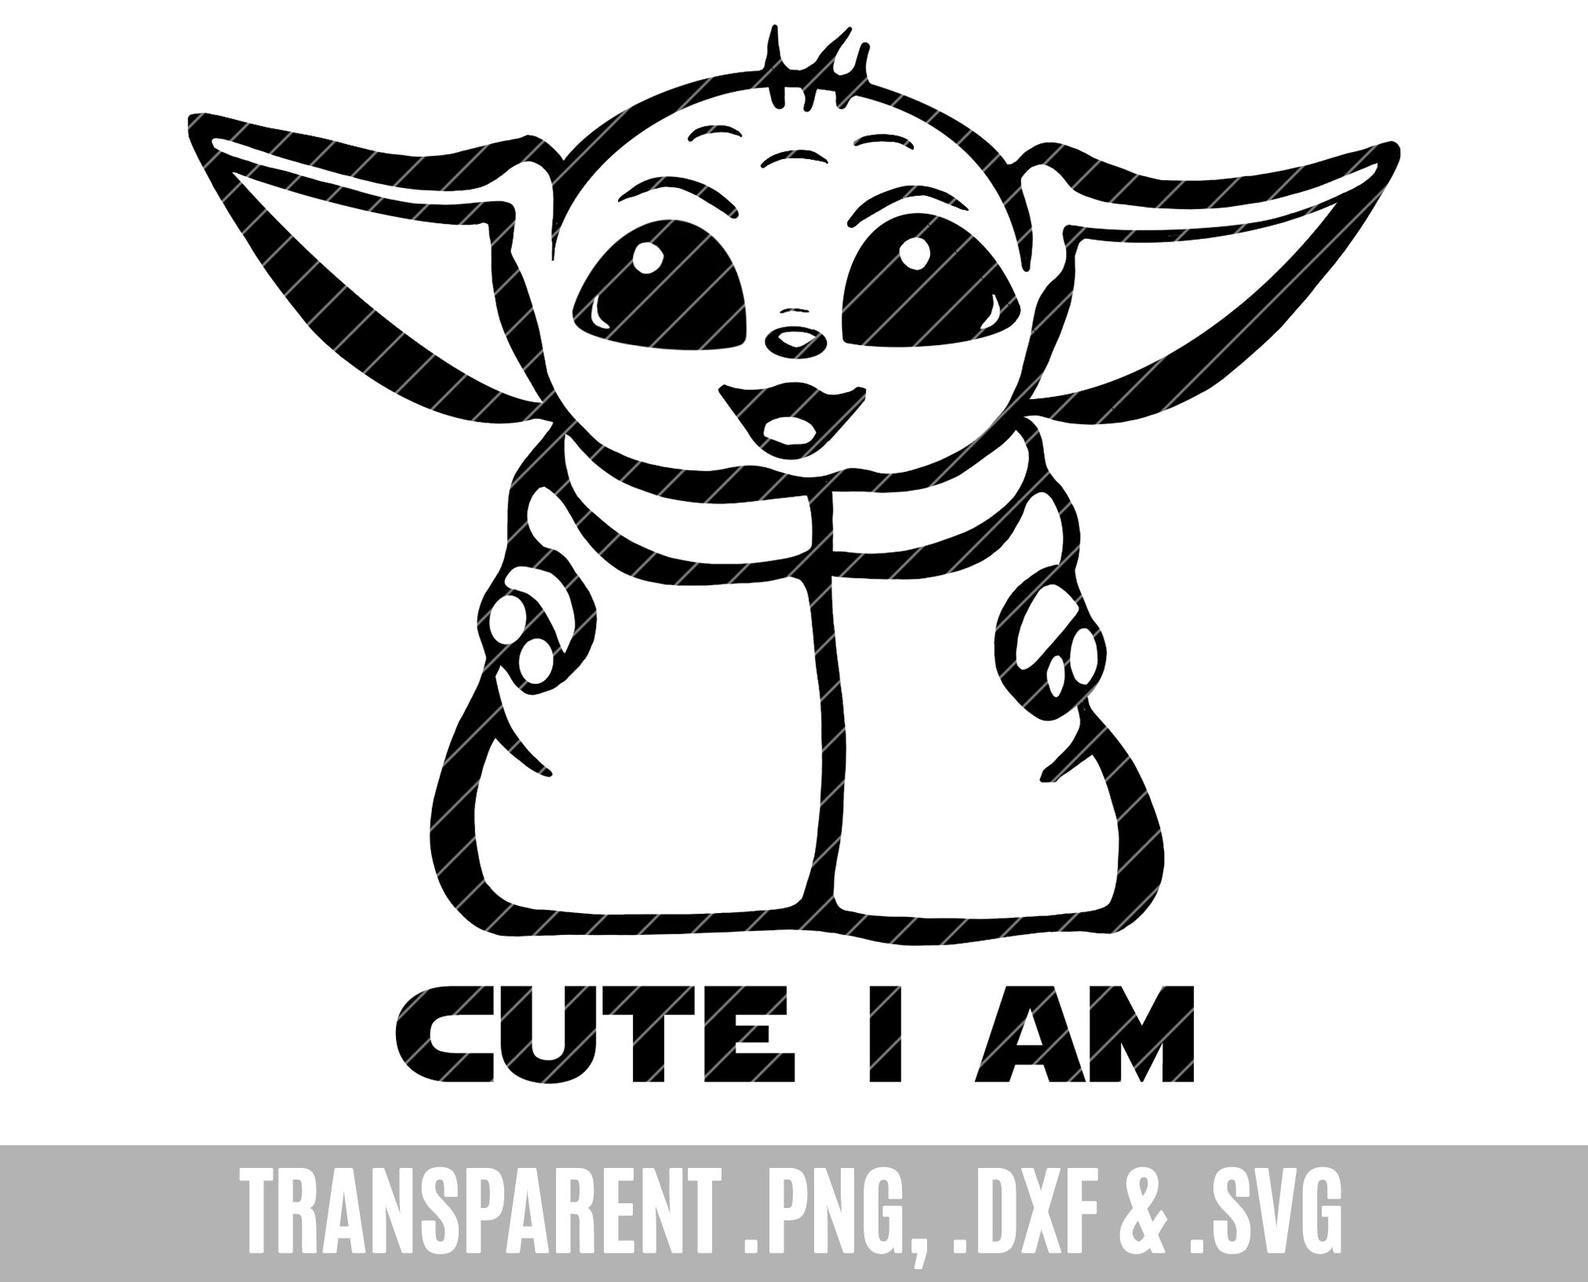 Baby Yoda Shirt Design Png Disney Silhouette Art Star Wars Art Disney Princess Silhouette